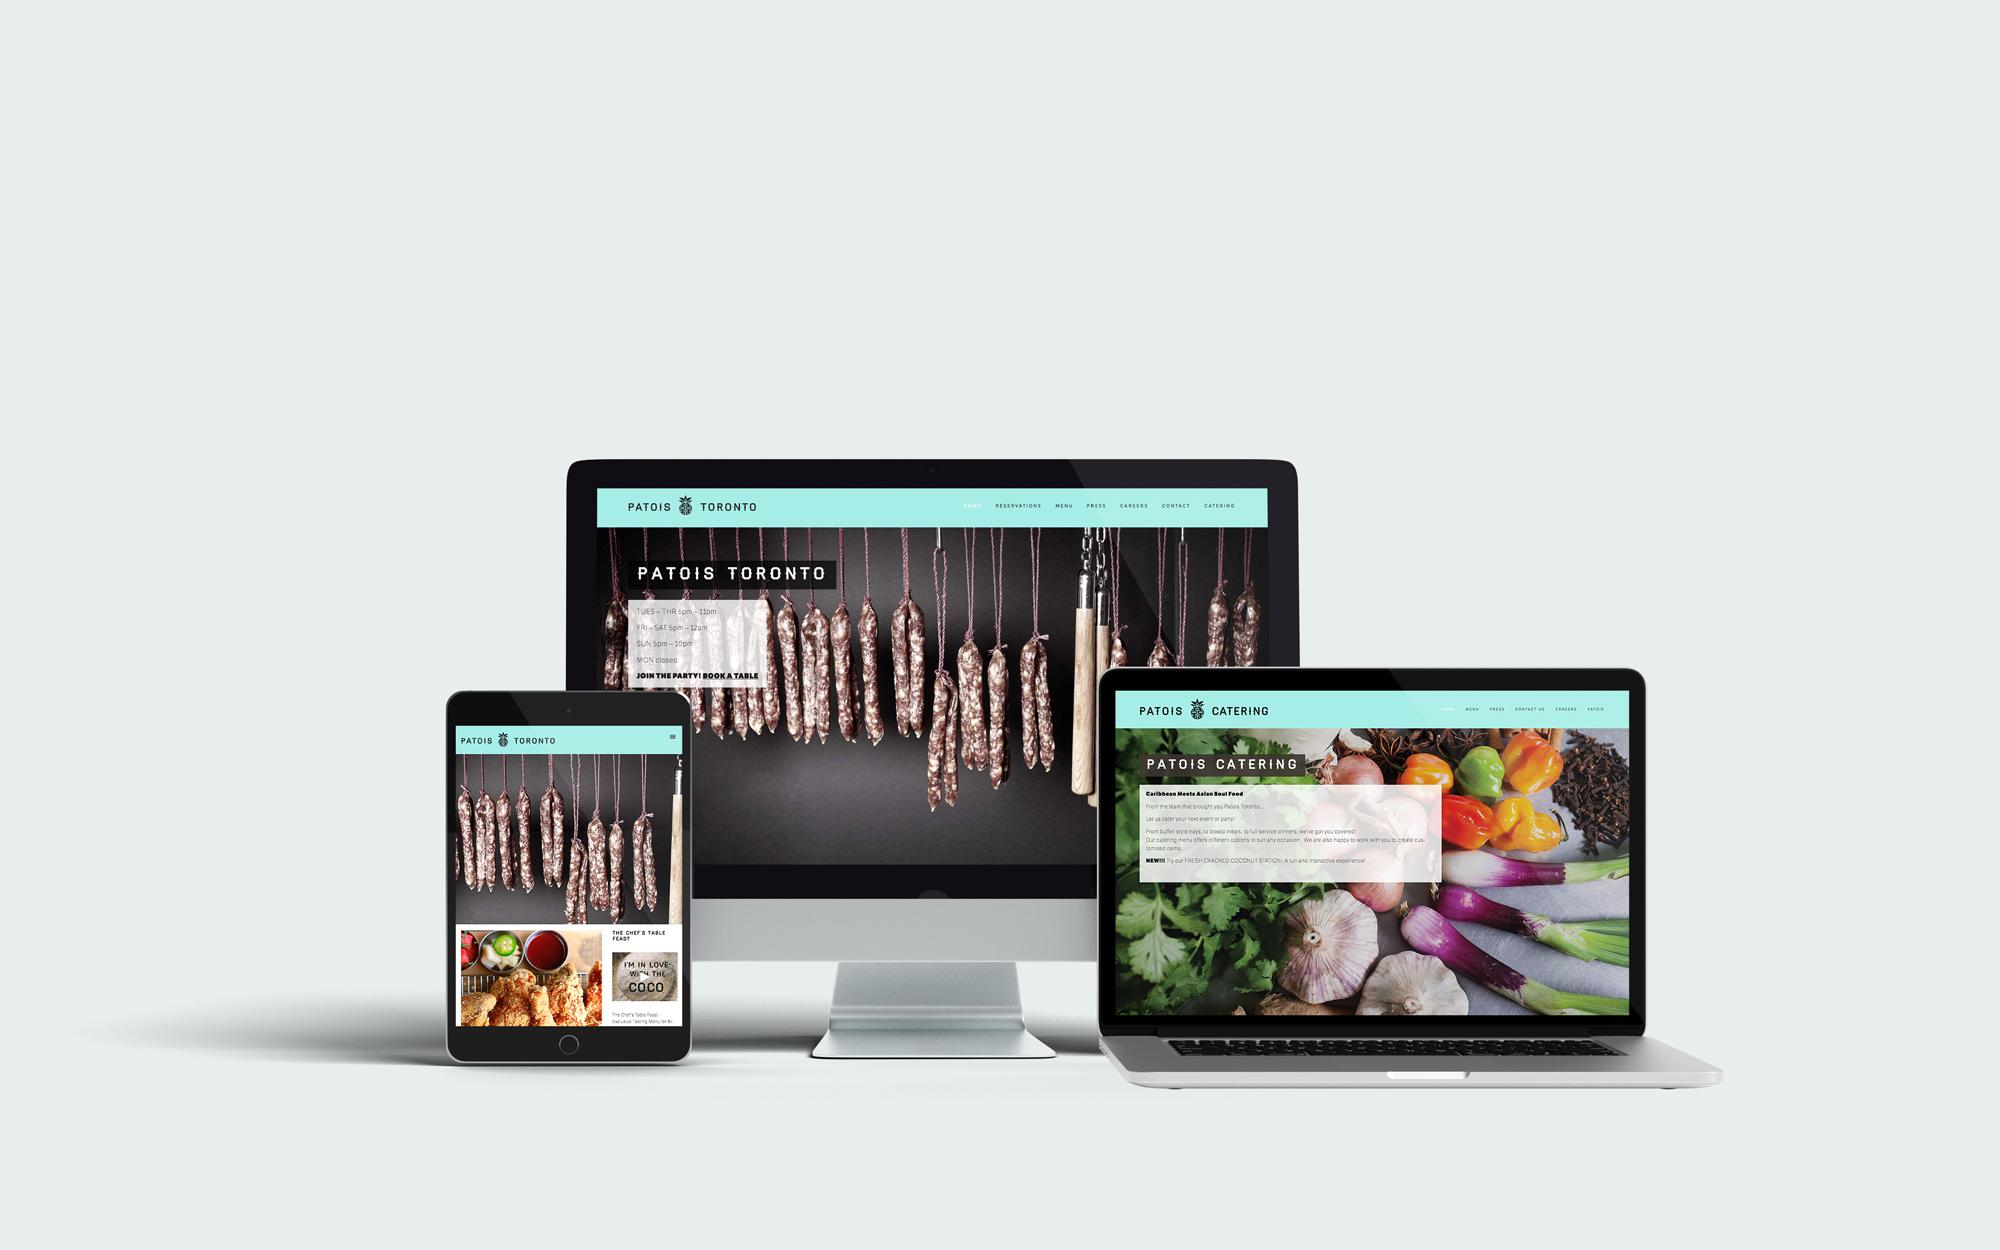 Patois Toronto Website. Designed by Elsie Lam.